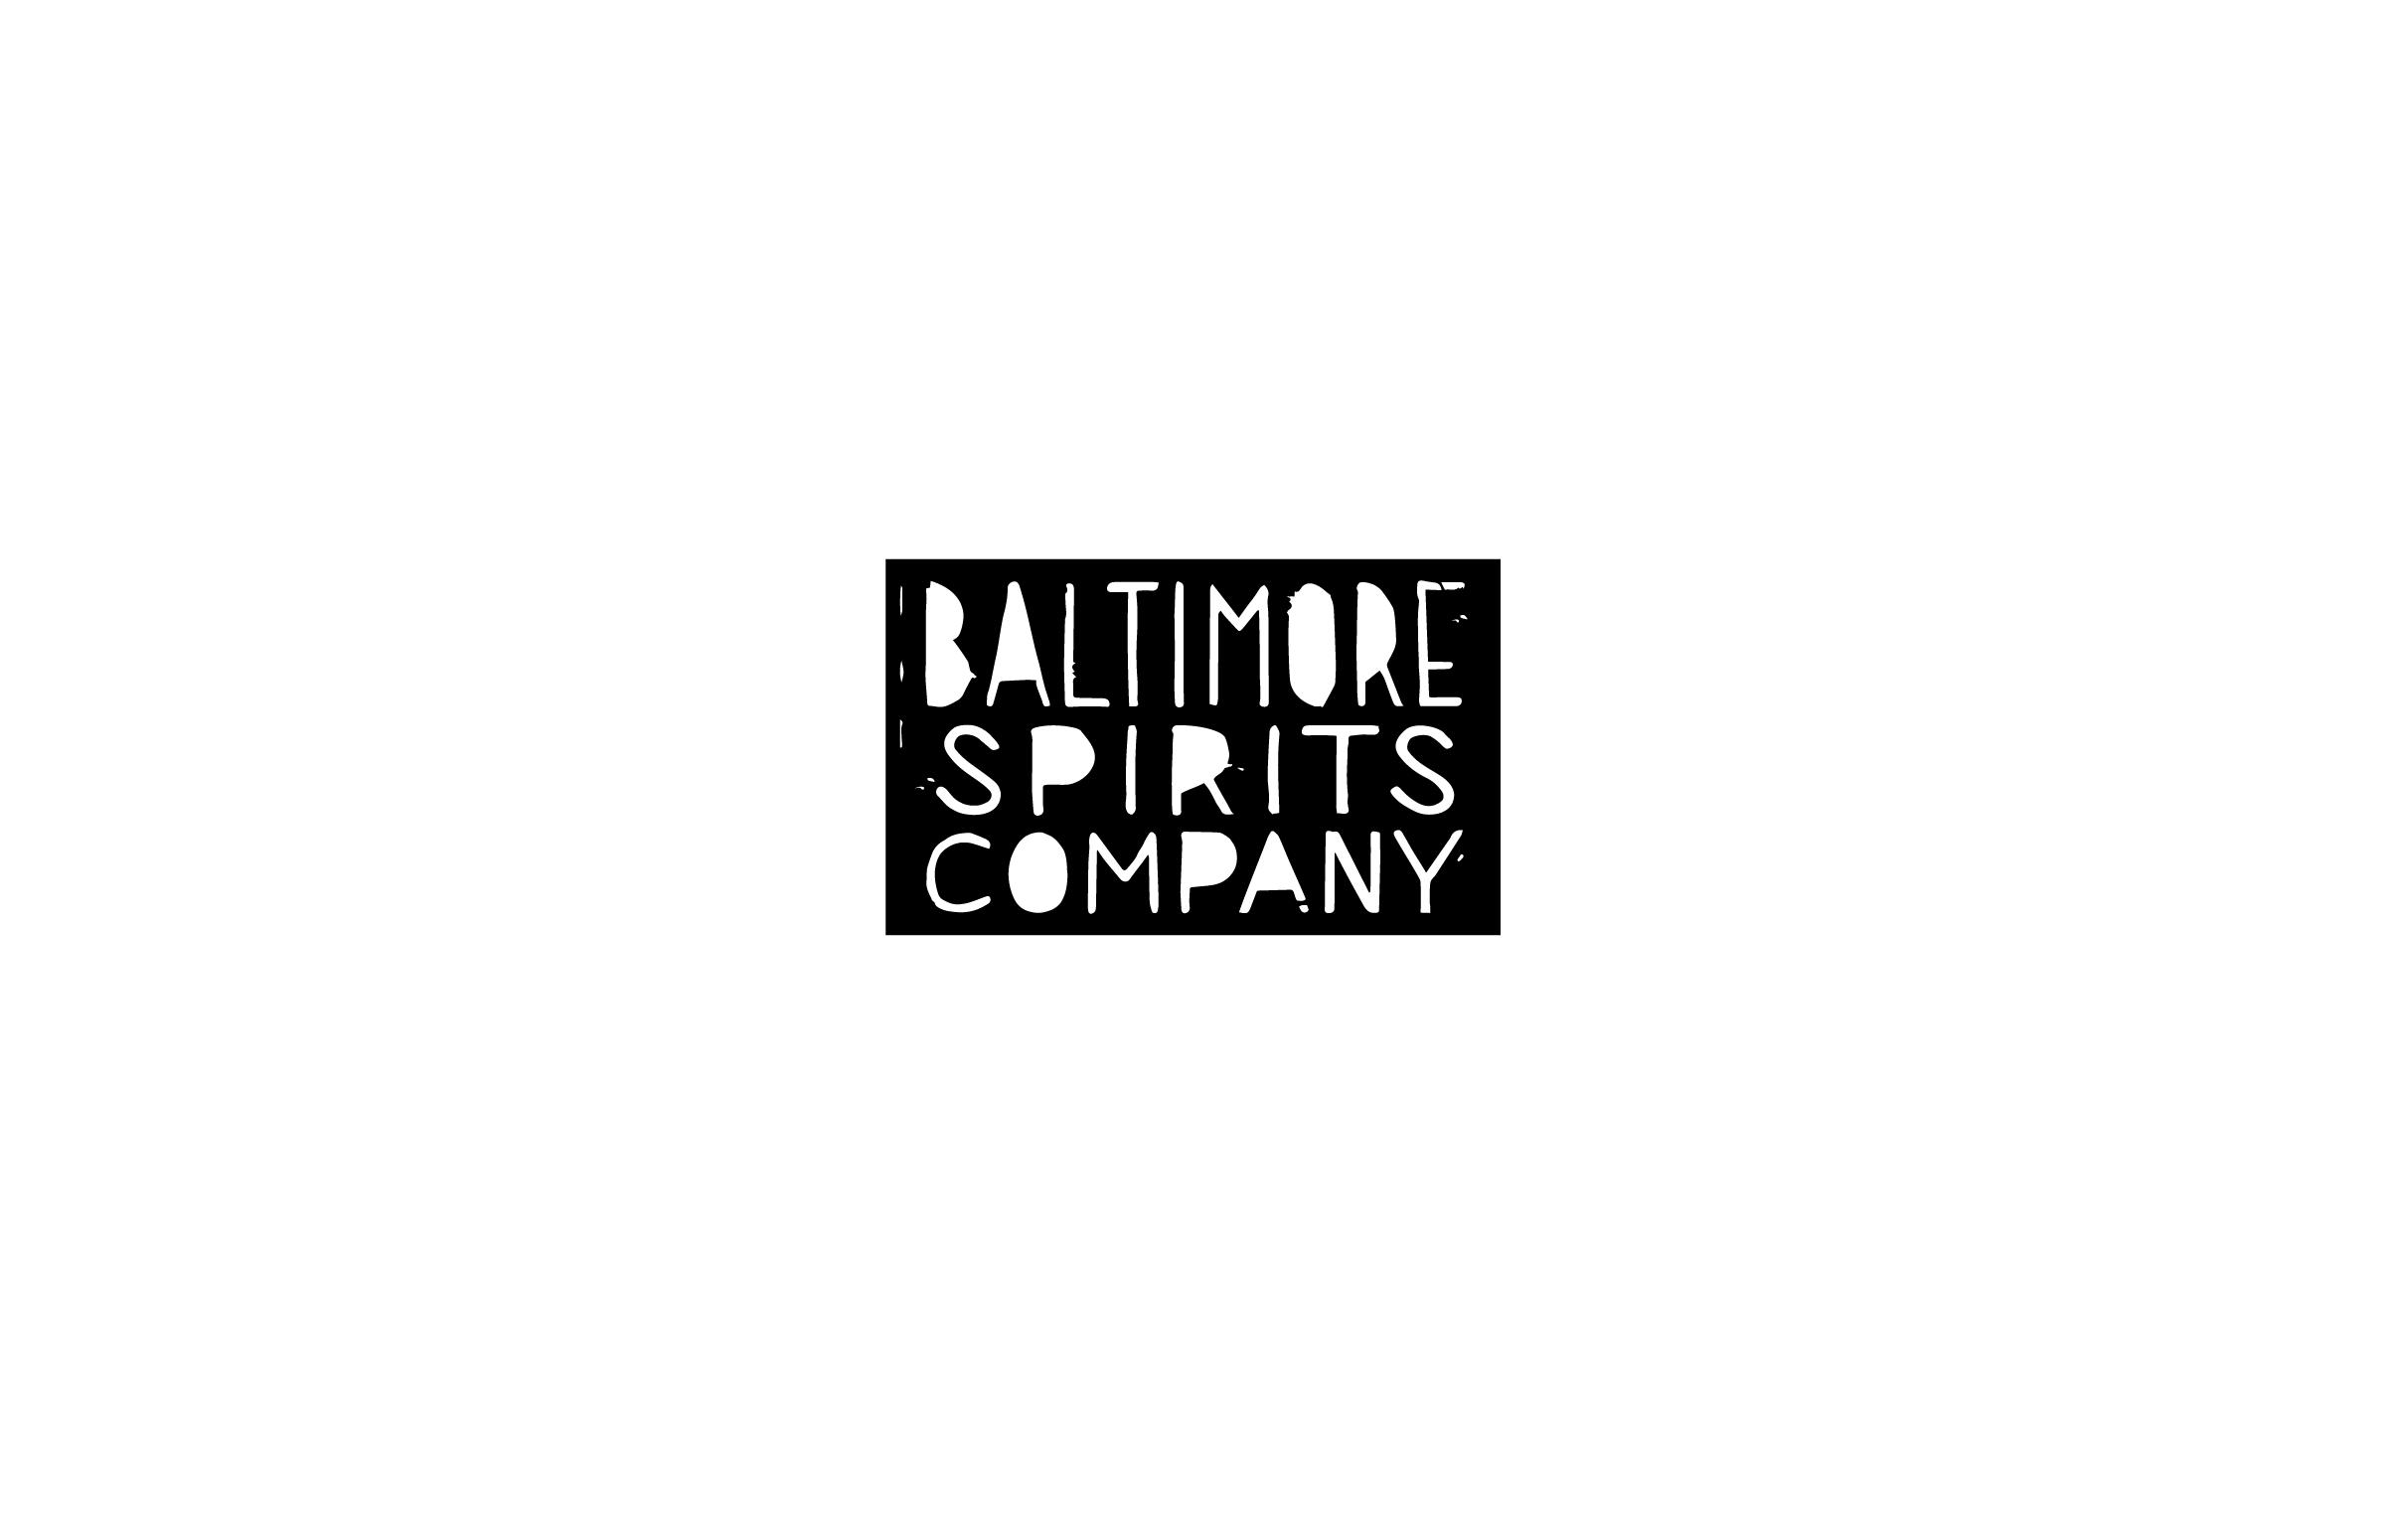 Baltimore Spirits Company: Logo Design